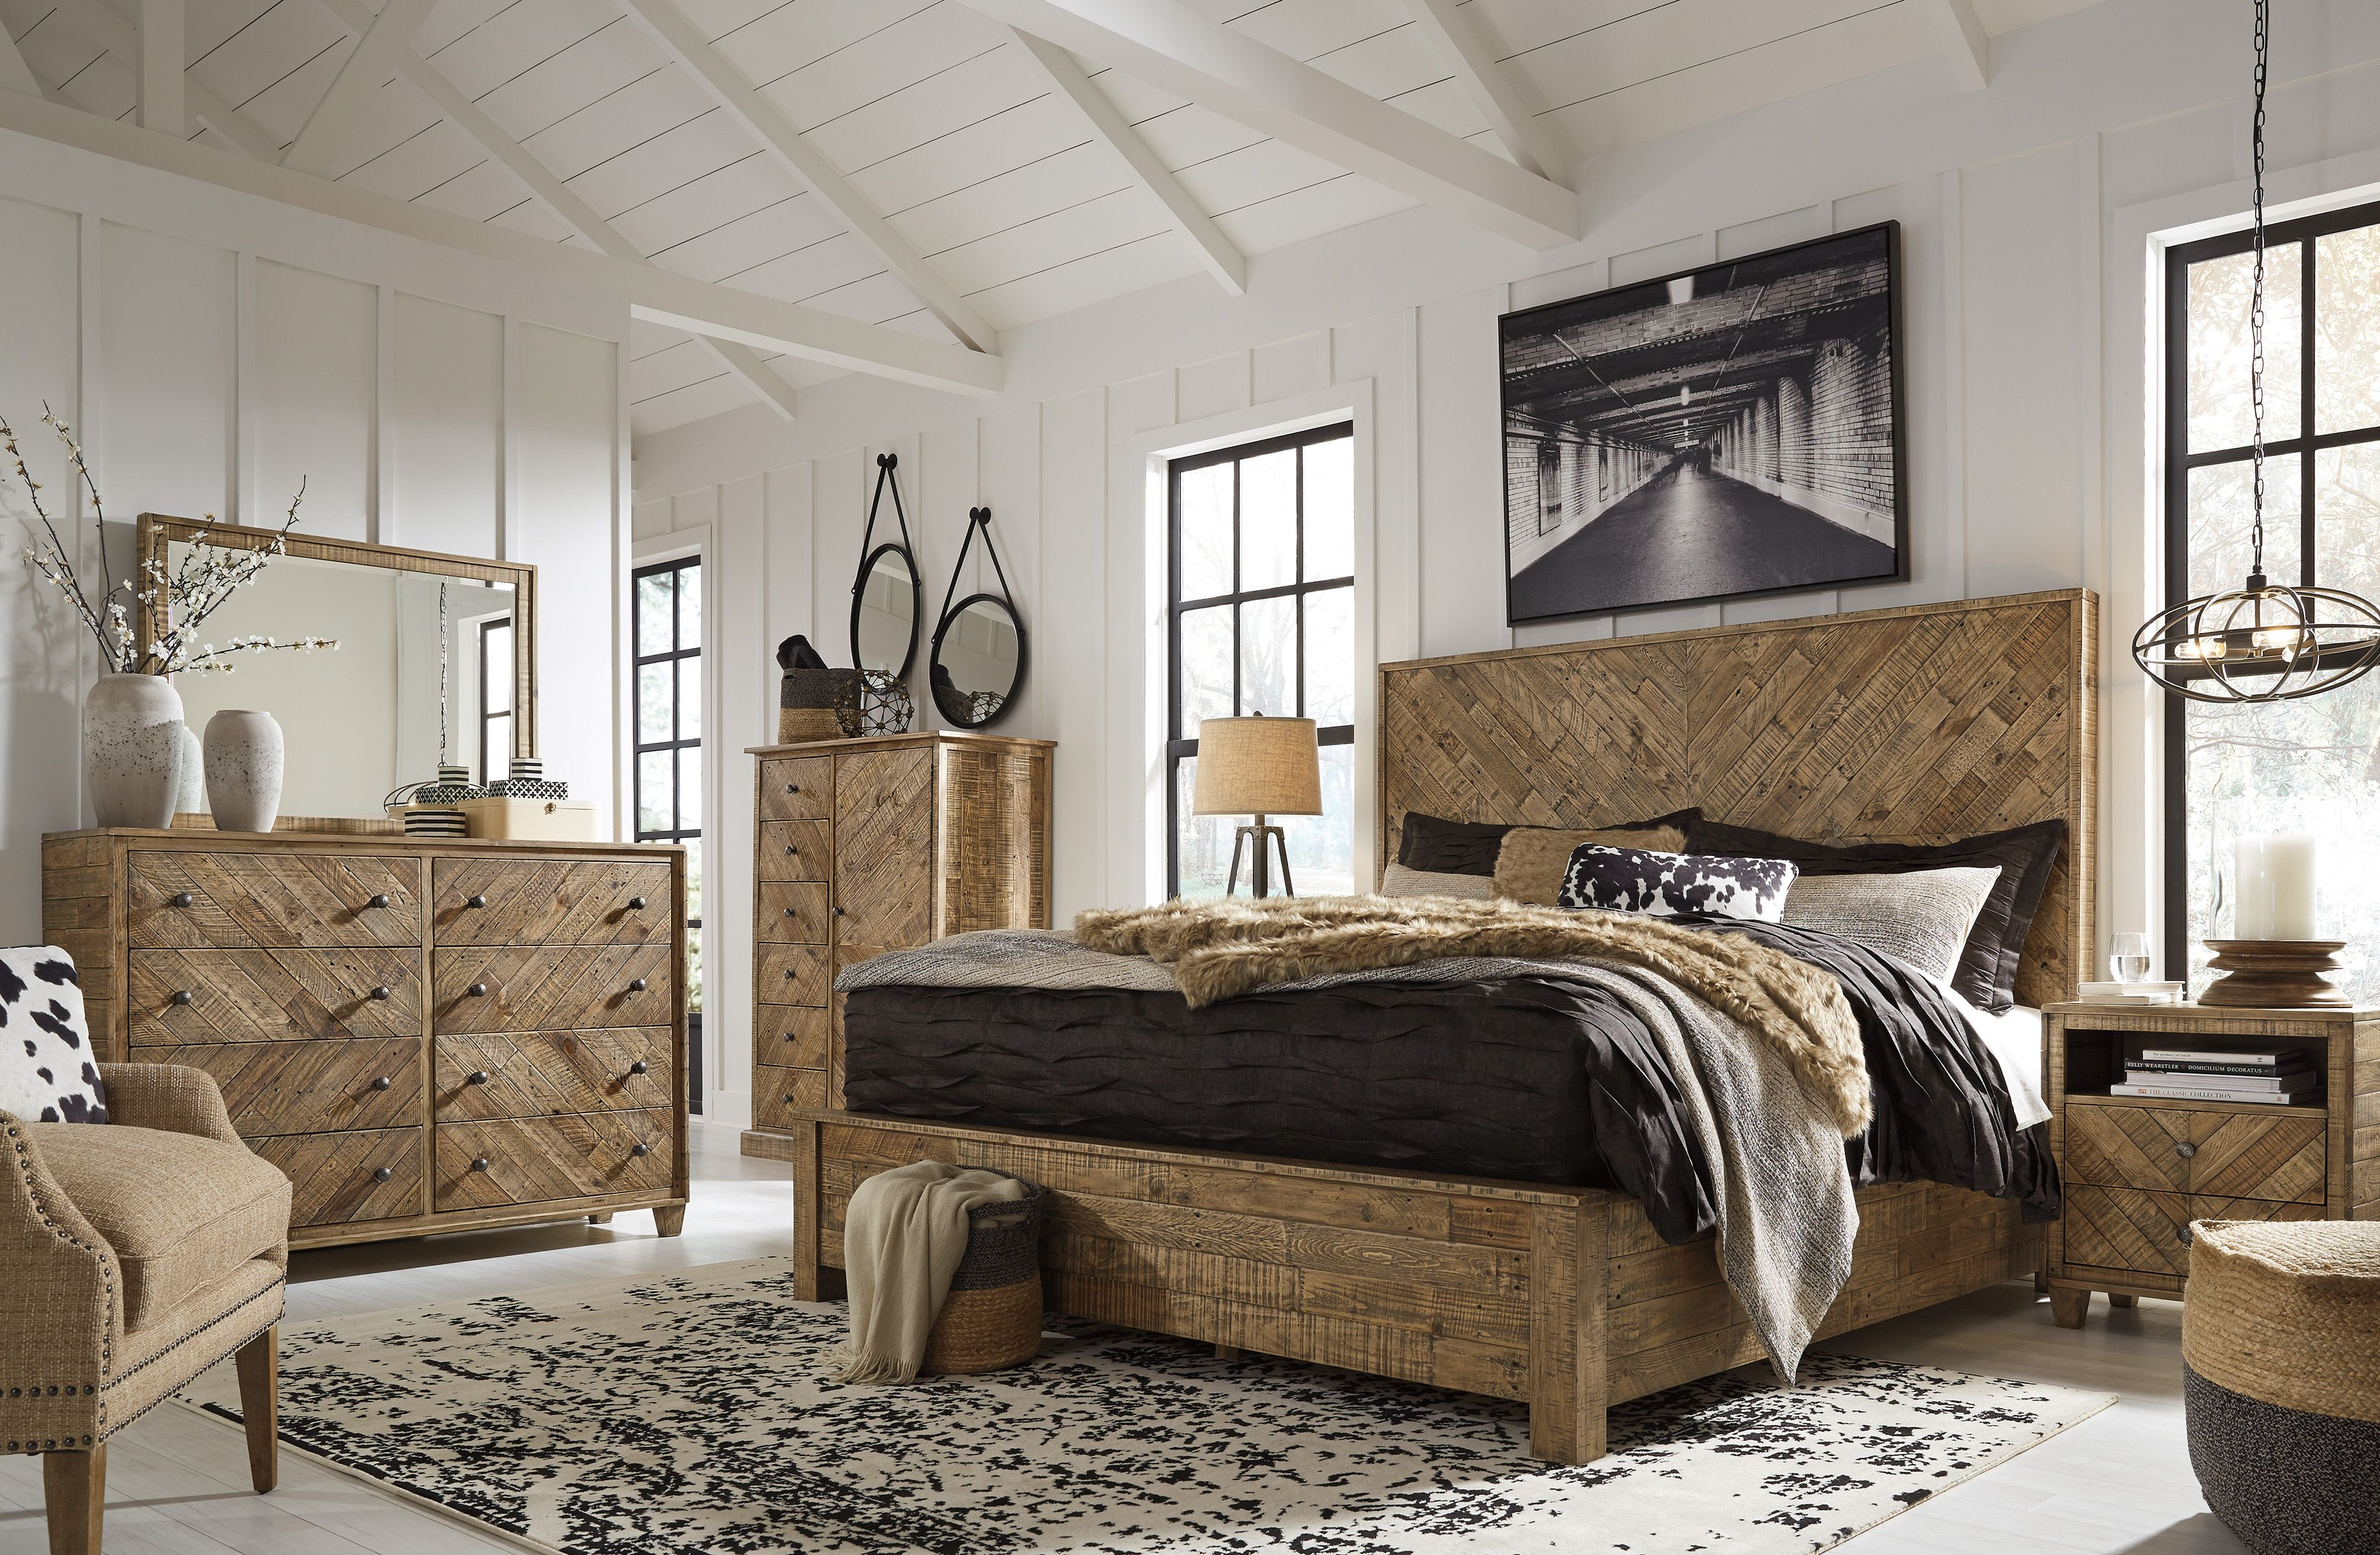 King 6pc Bedroom Set At Lucas Furniture In 2020 Light Brown Bedrooms King Bedroom Sets Bedroom Set